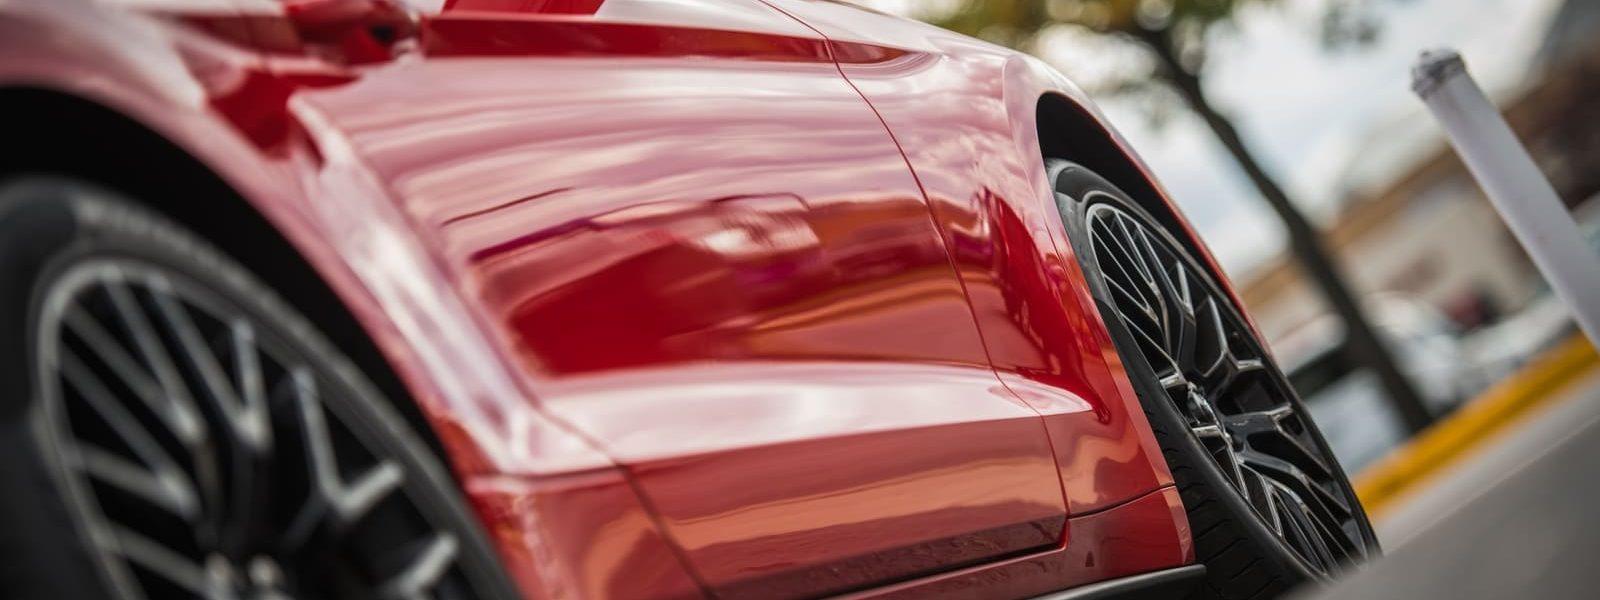 siO2 silica quartz nano car polish on sports car